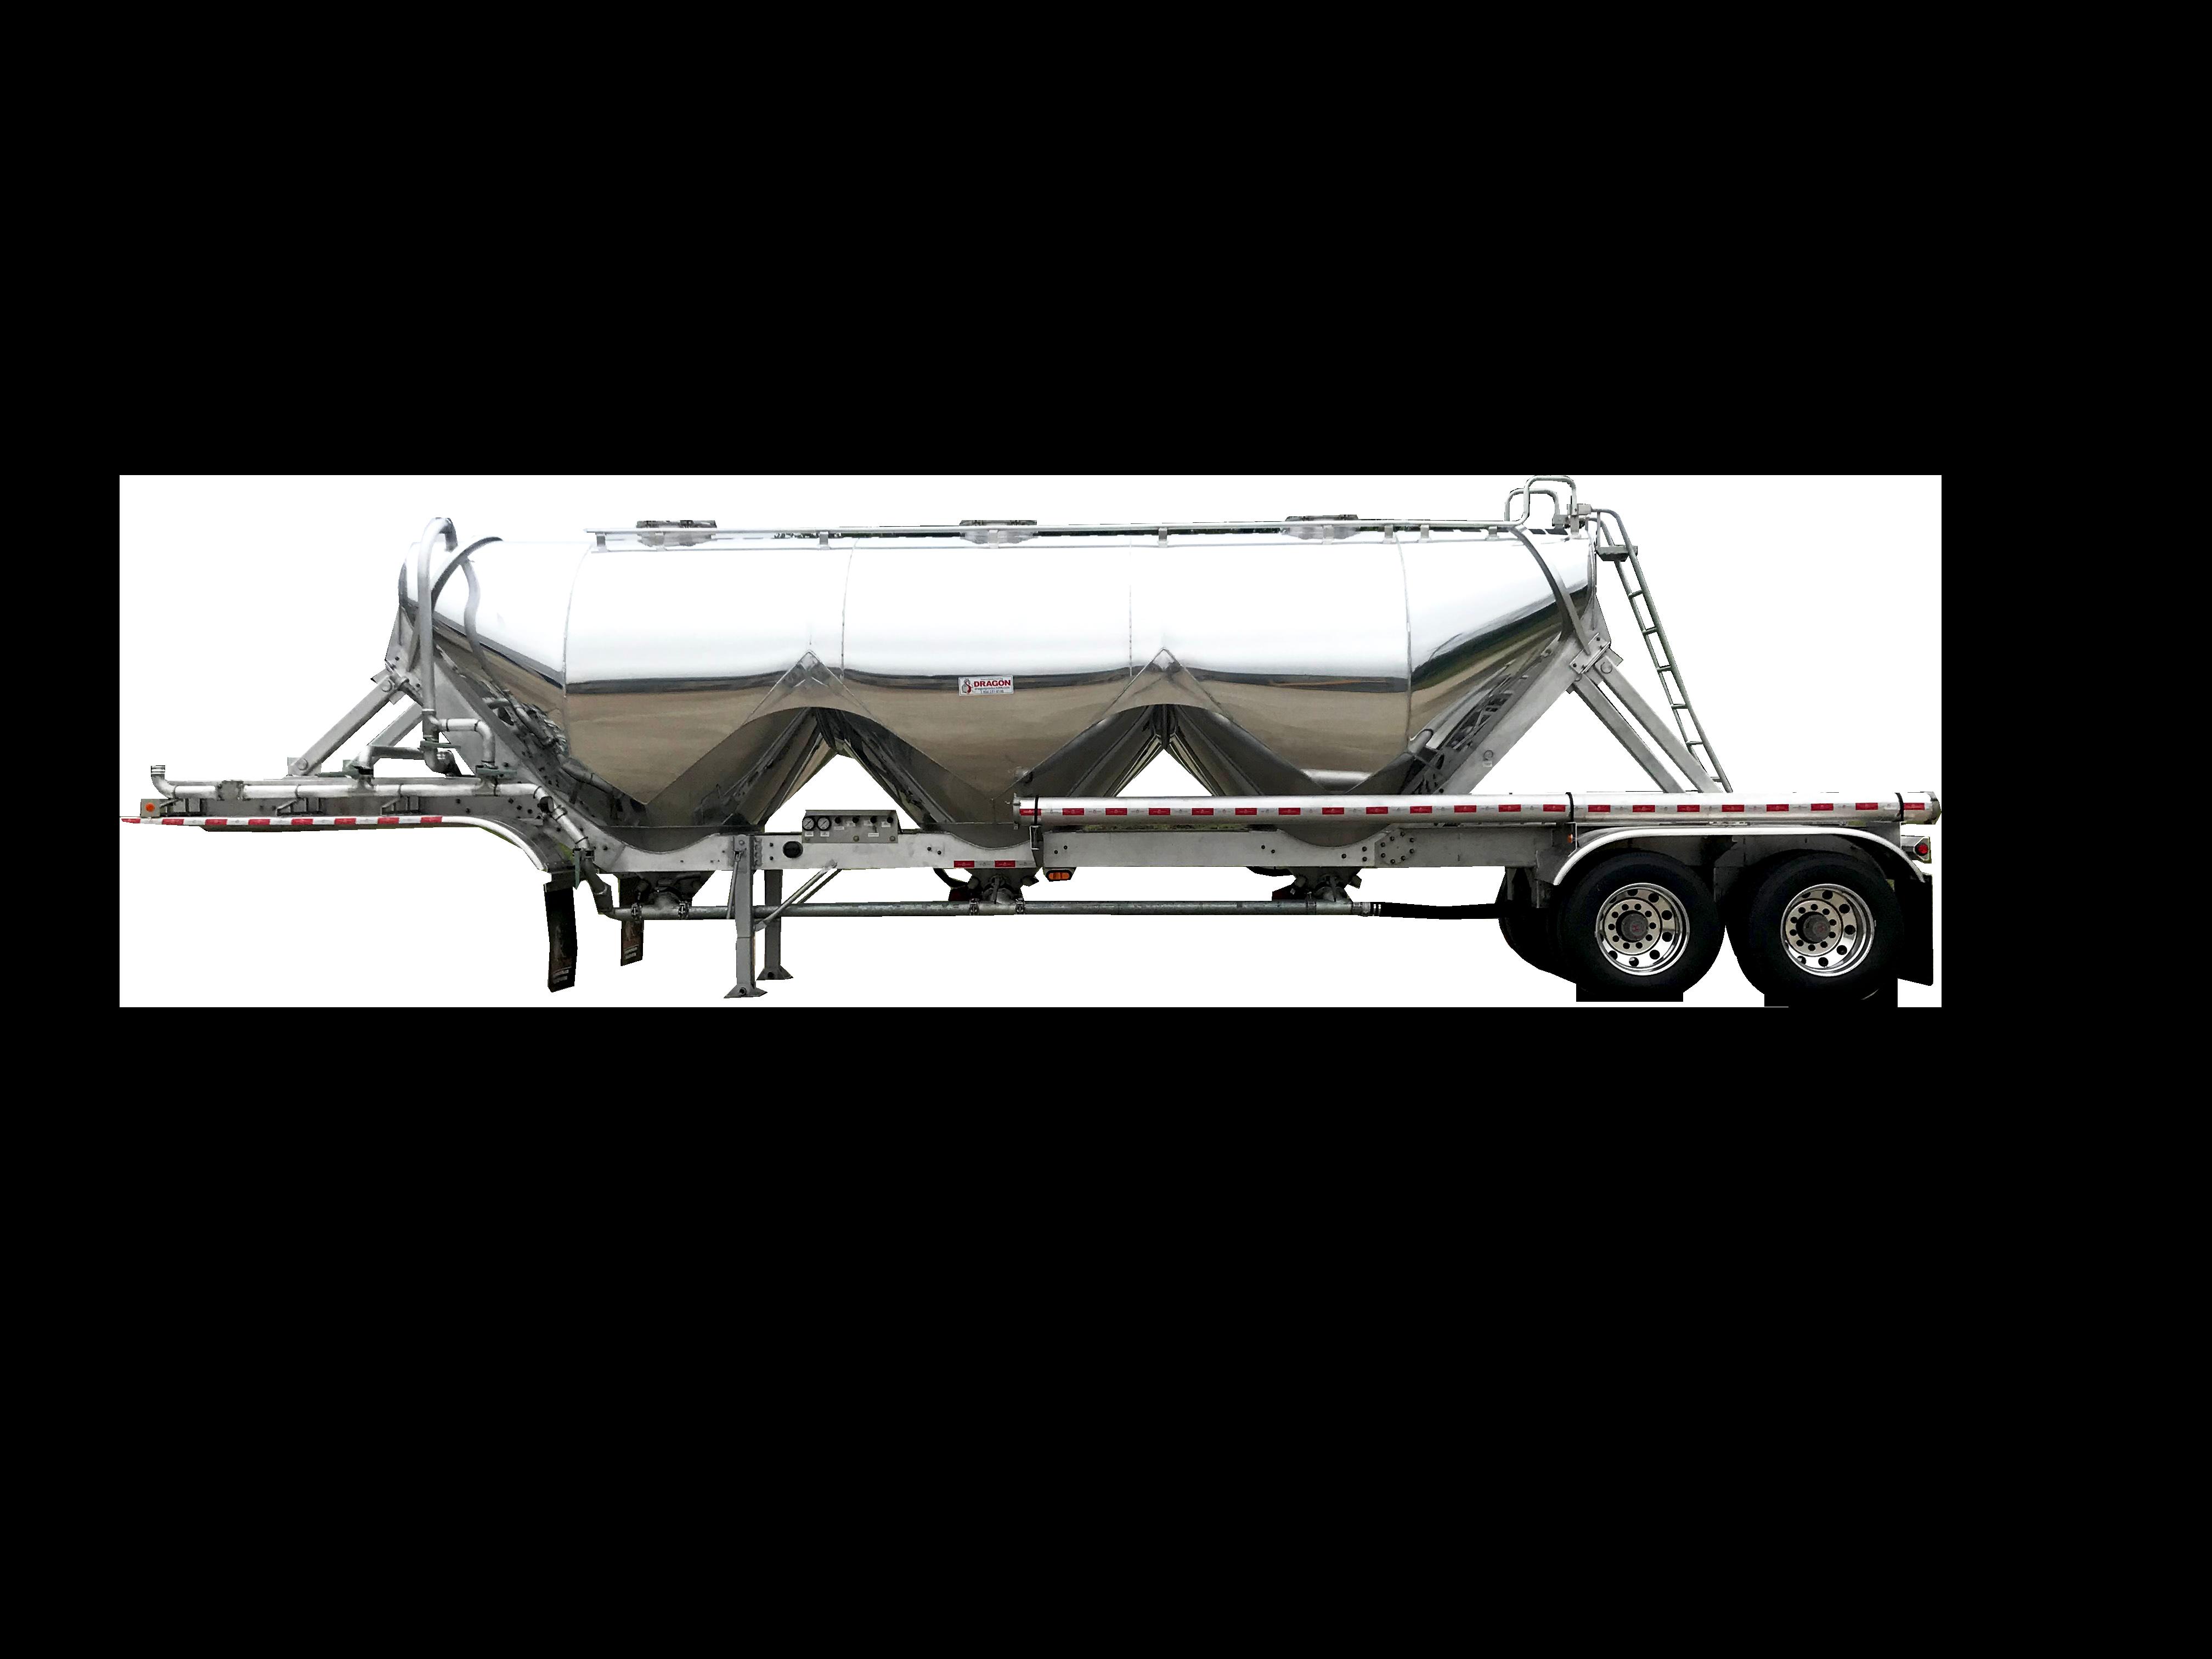 Vantage Full Frame Aluminum Pneumatic